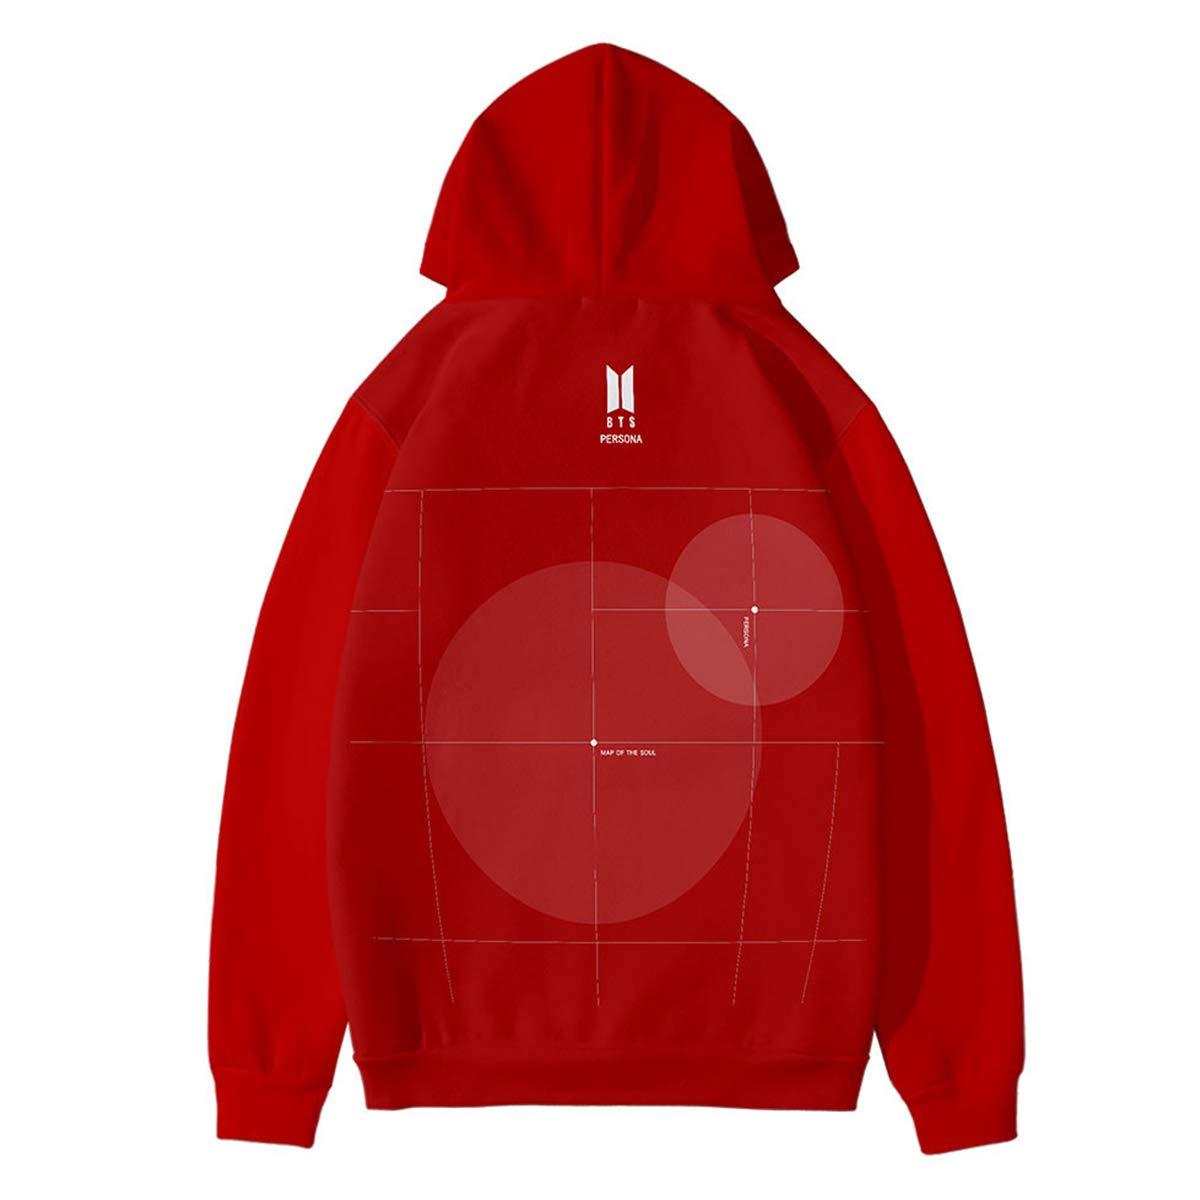 Qaedtls Kpop BTS Hoodie Map of The Soul Persona Sweater Suga V Jimin Jungkook Sweatshirts